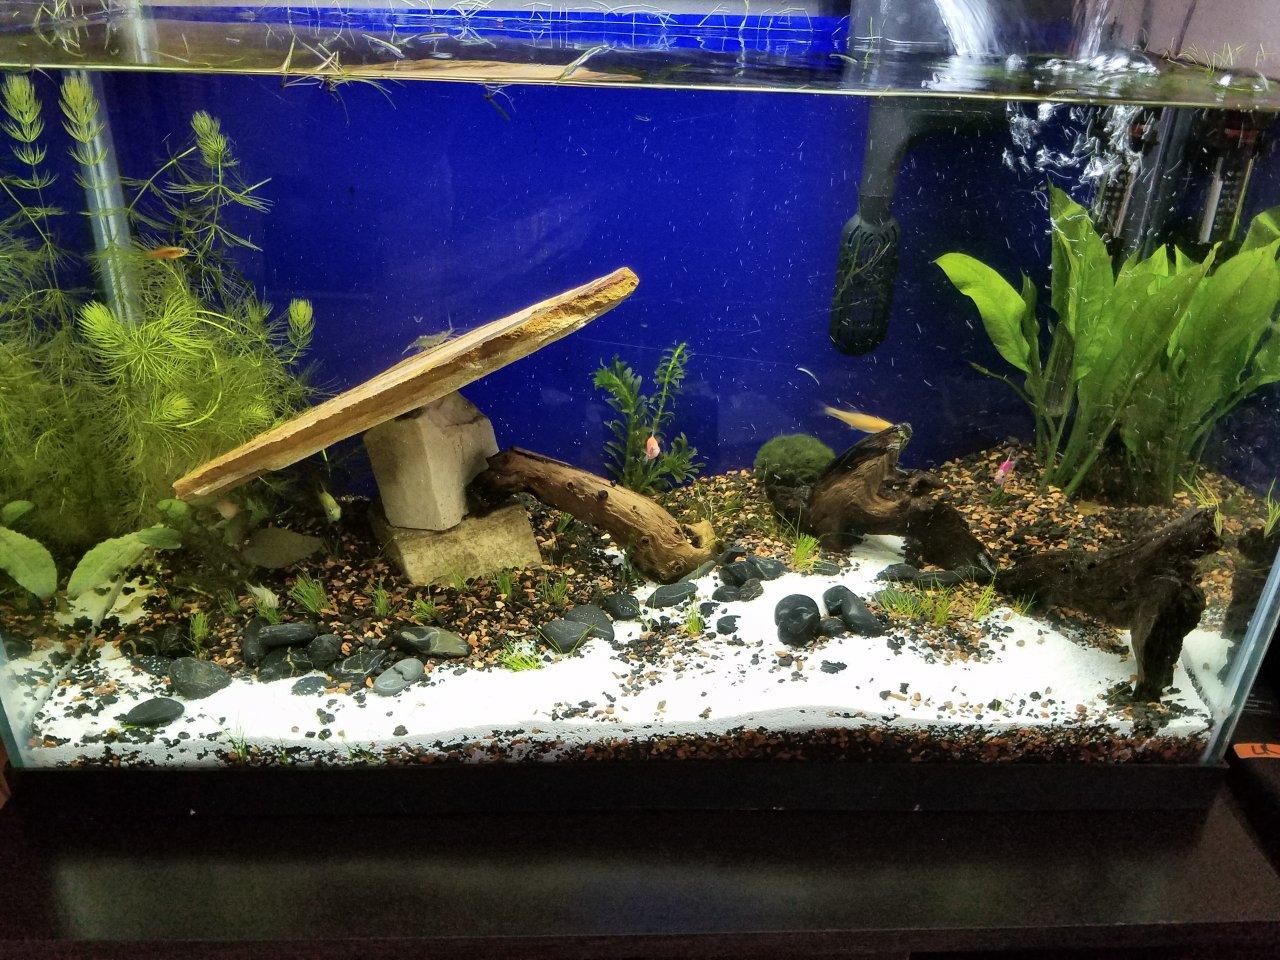 20 Gallon Tall Stocking My Aquarium Club